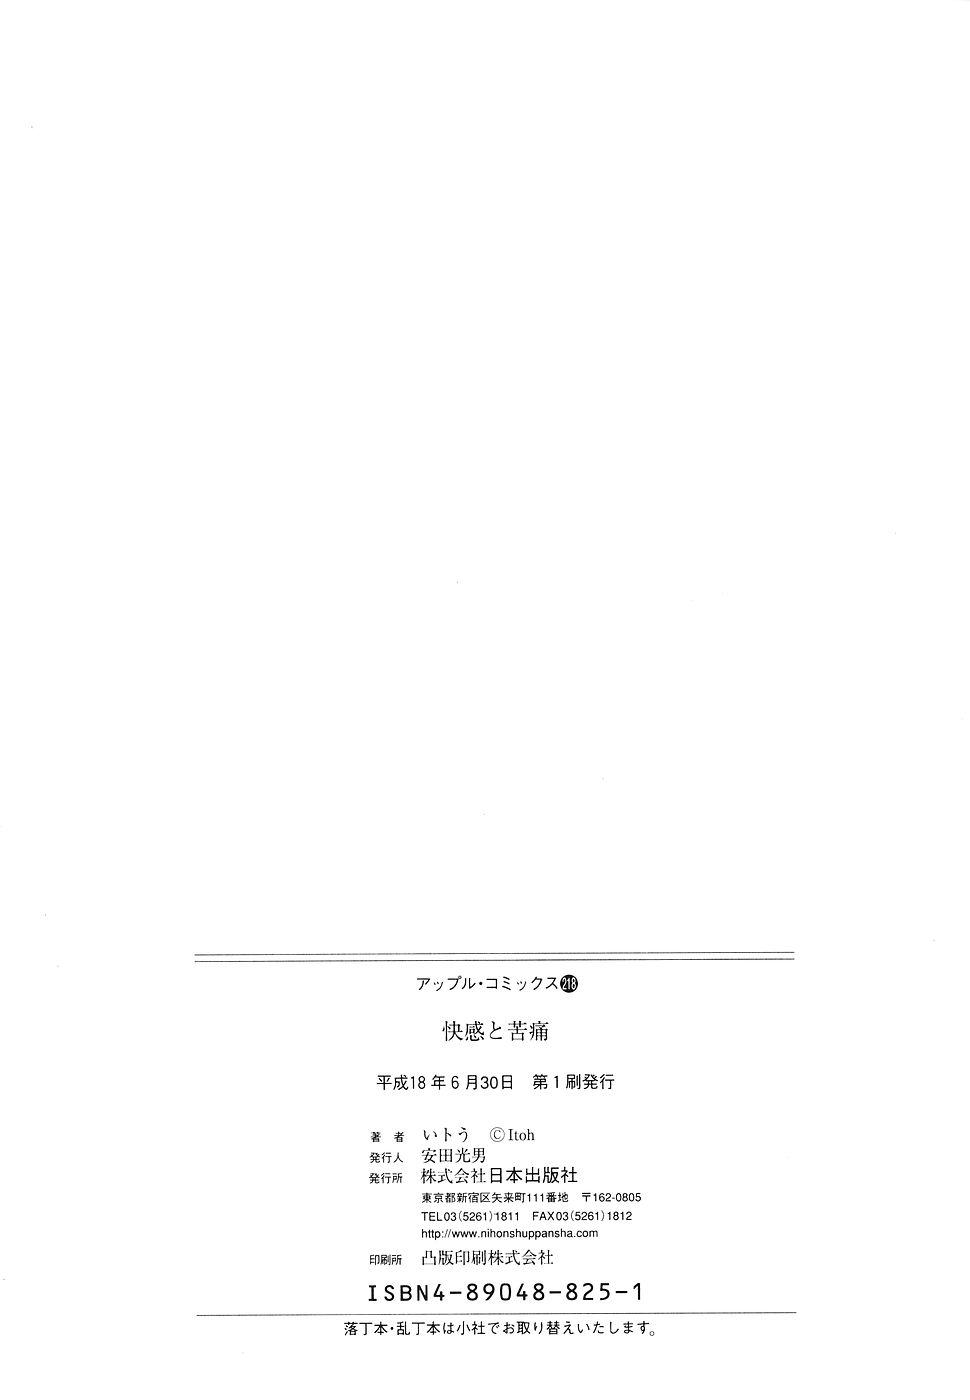 Kaikan to Kutsuu - Pleasure and Pain 164